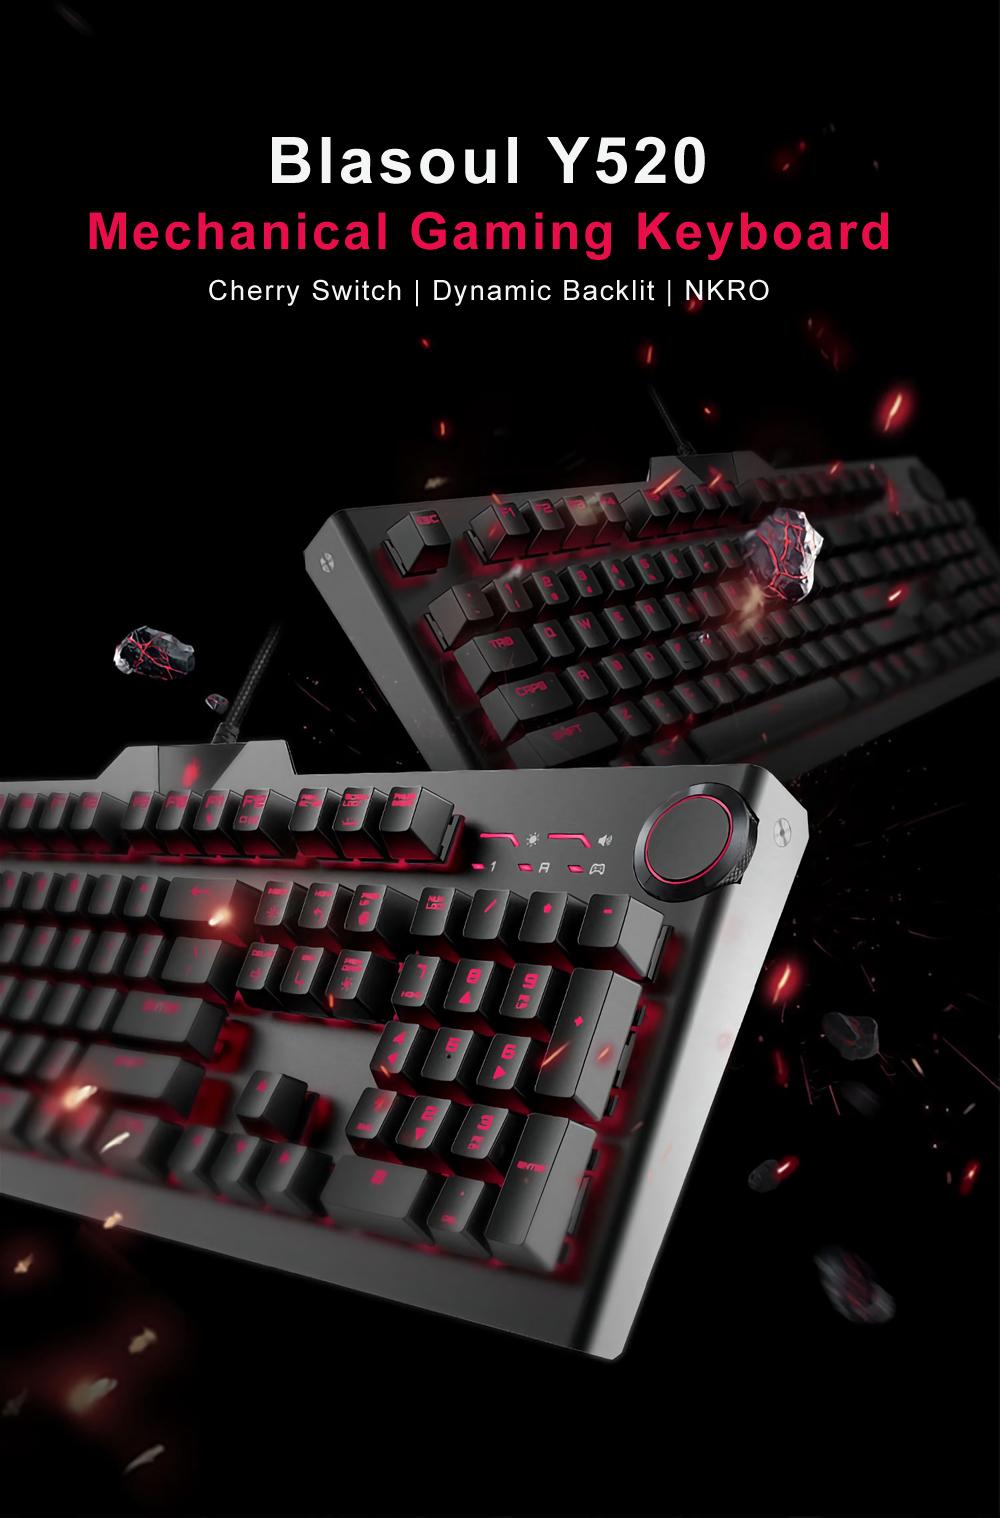 Blasoul Y520 Gaming Mechanical Keyboard 104 Keys 15 Rgb Backlight Ducky One Black Non Backlit Cherry Mx Blue Switch 1000hz Wired